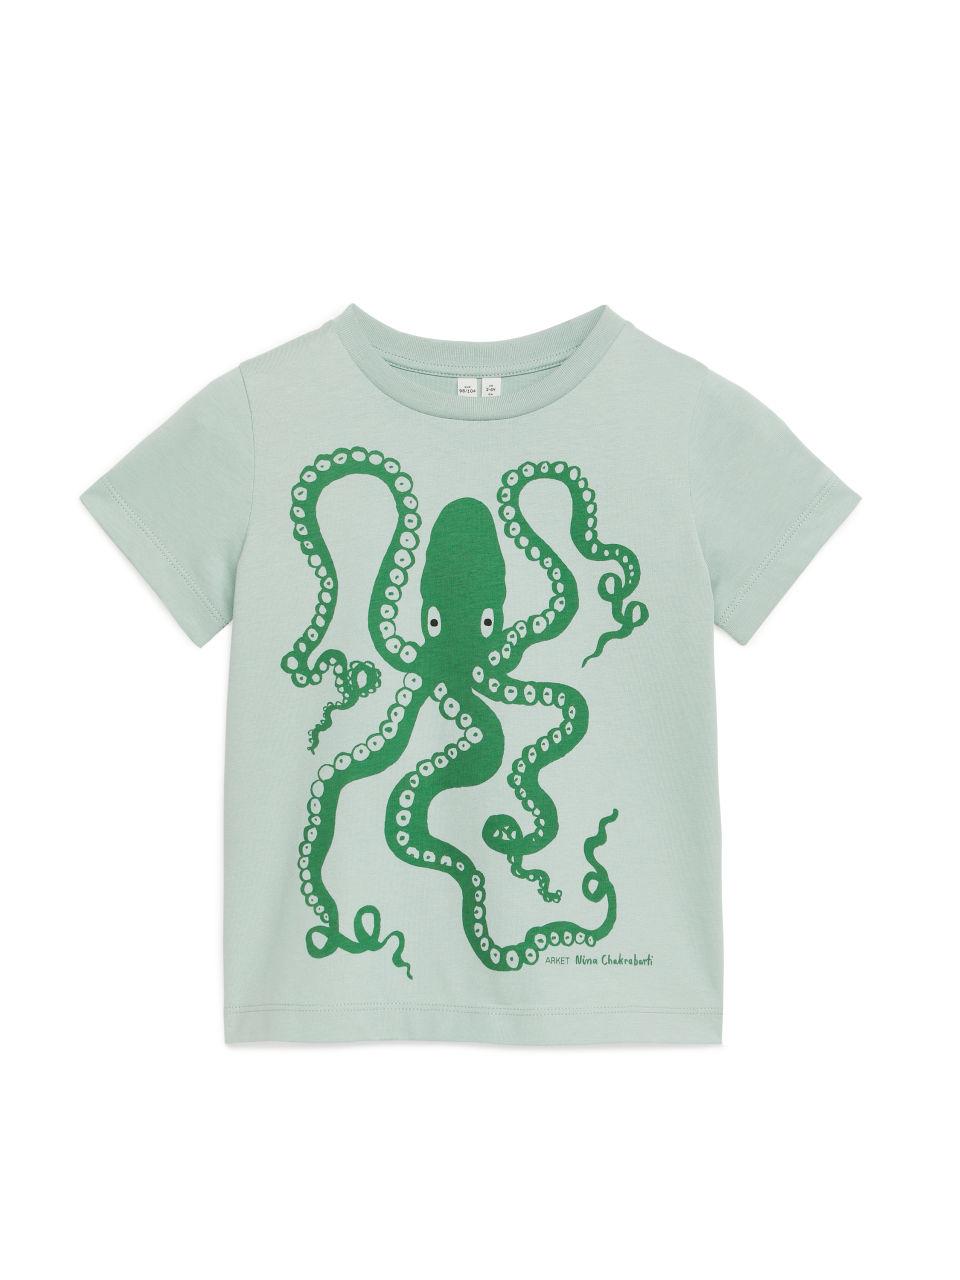 Artist Edition T-Shirt - Turquoise